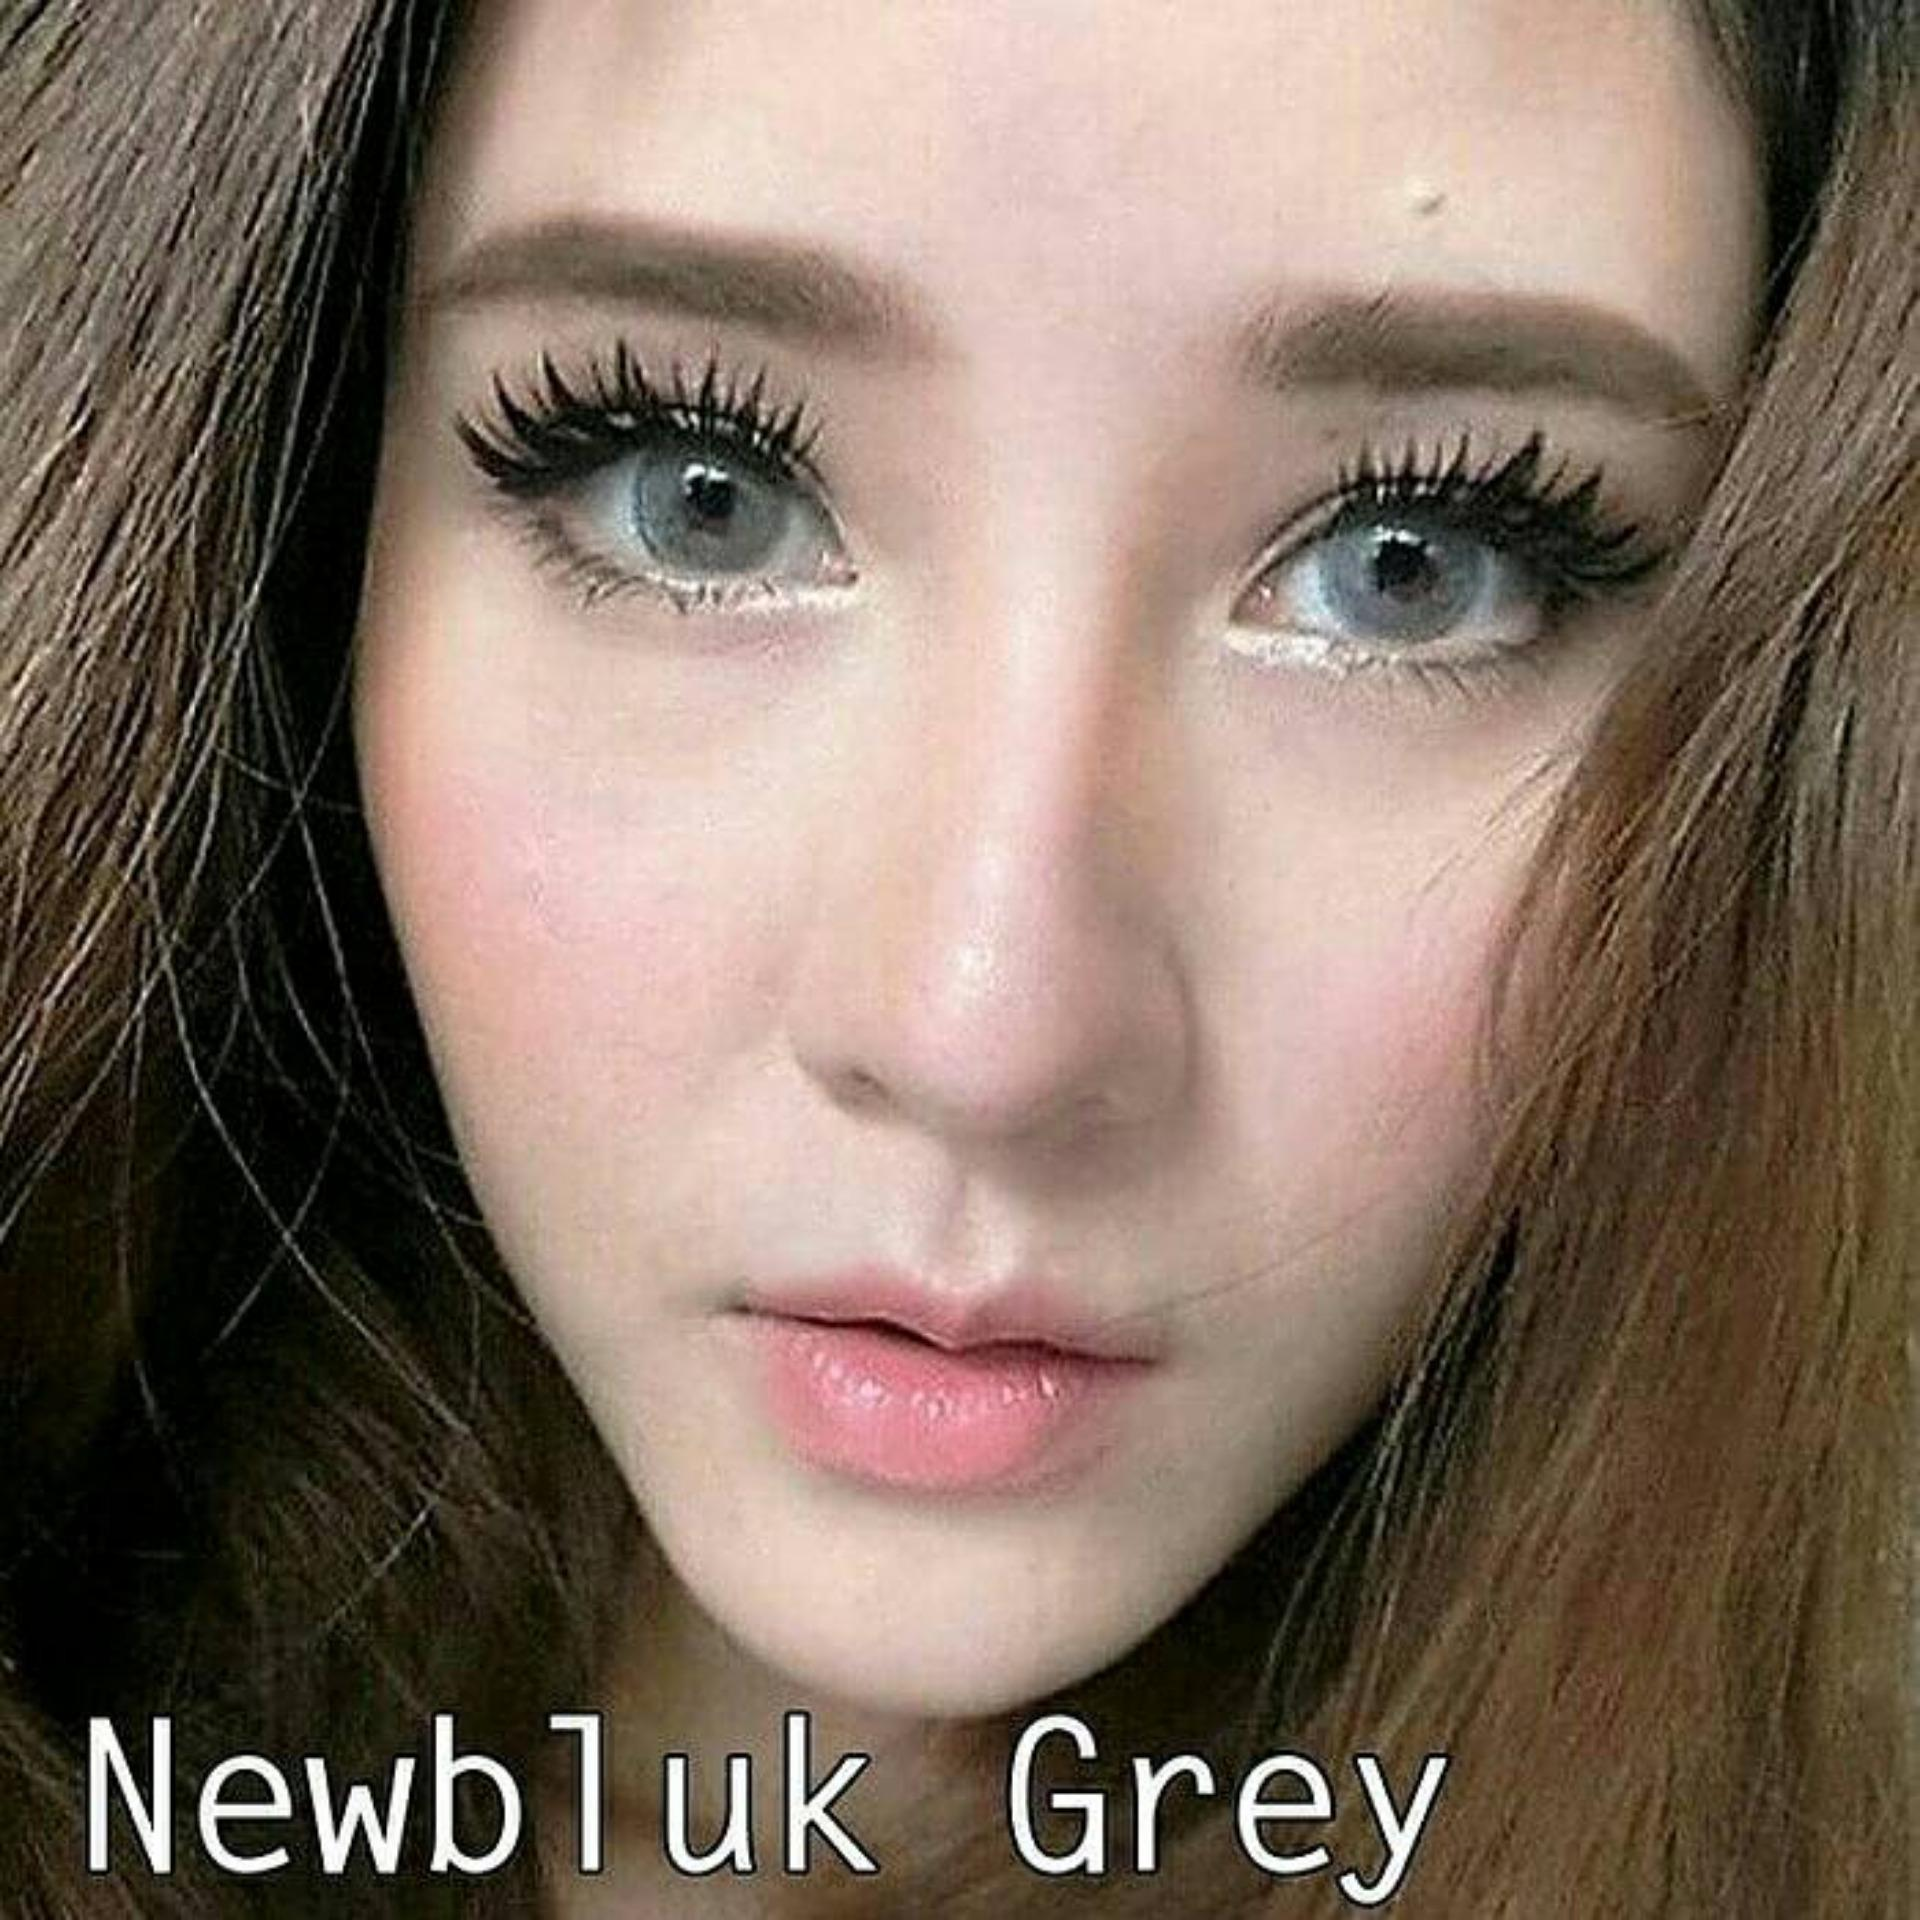 Jual Beli Softlens Newbluk Grey Normal Free Nice Look 60ml November Air 60 Ml